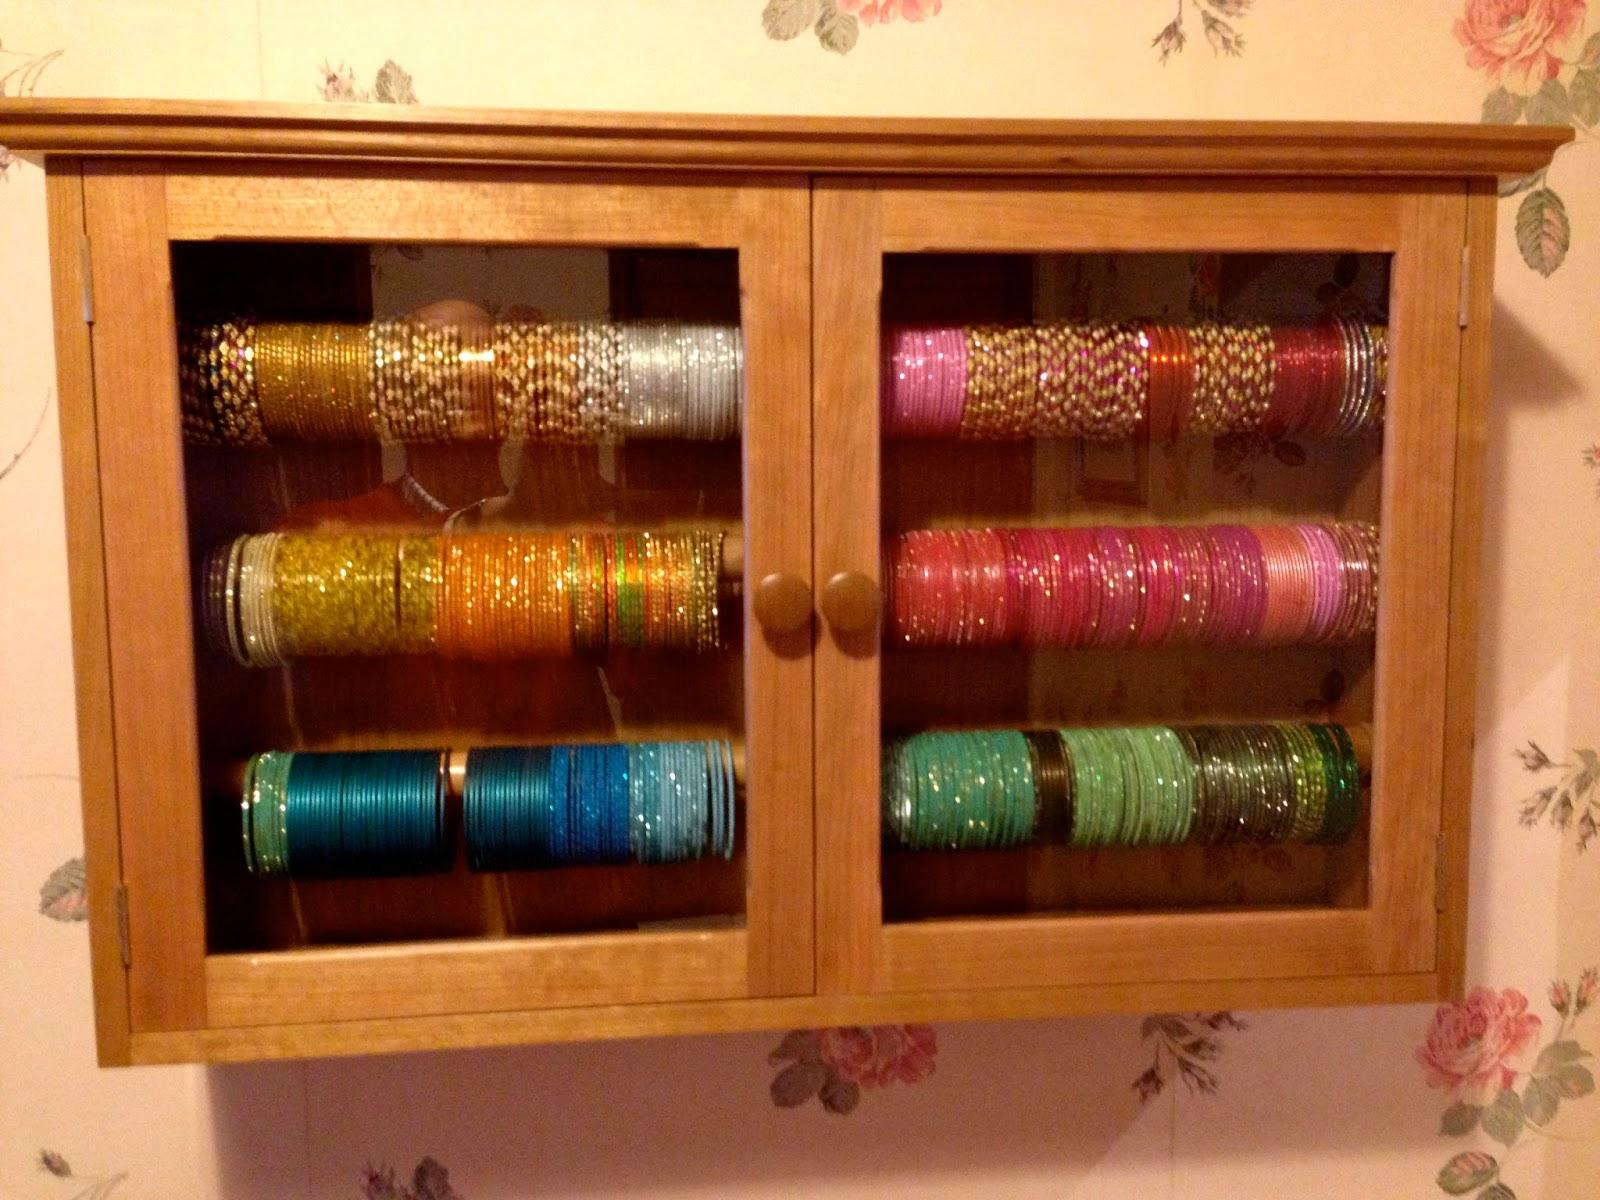 stylish bangles stand full of glass bangles for girls - Sari Info